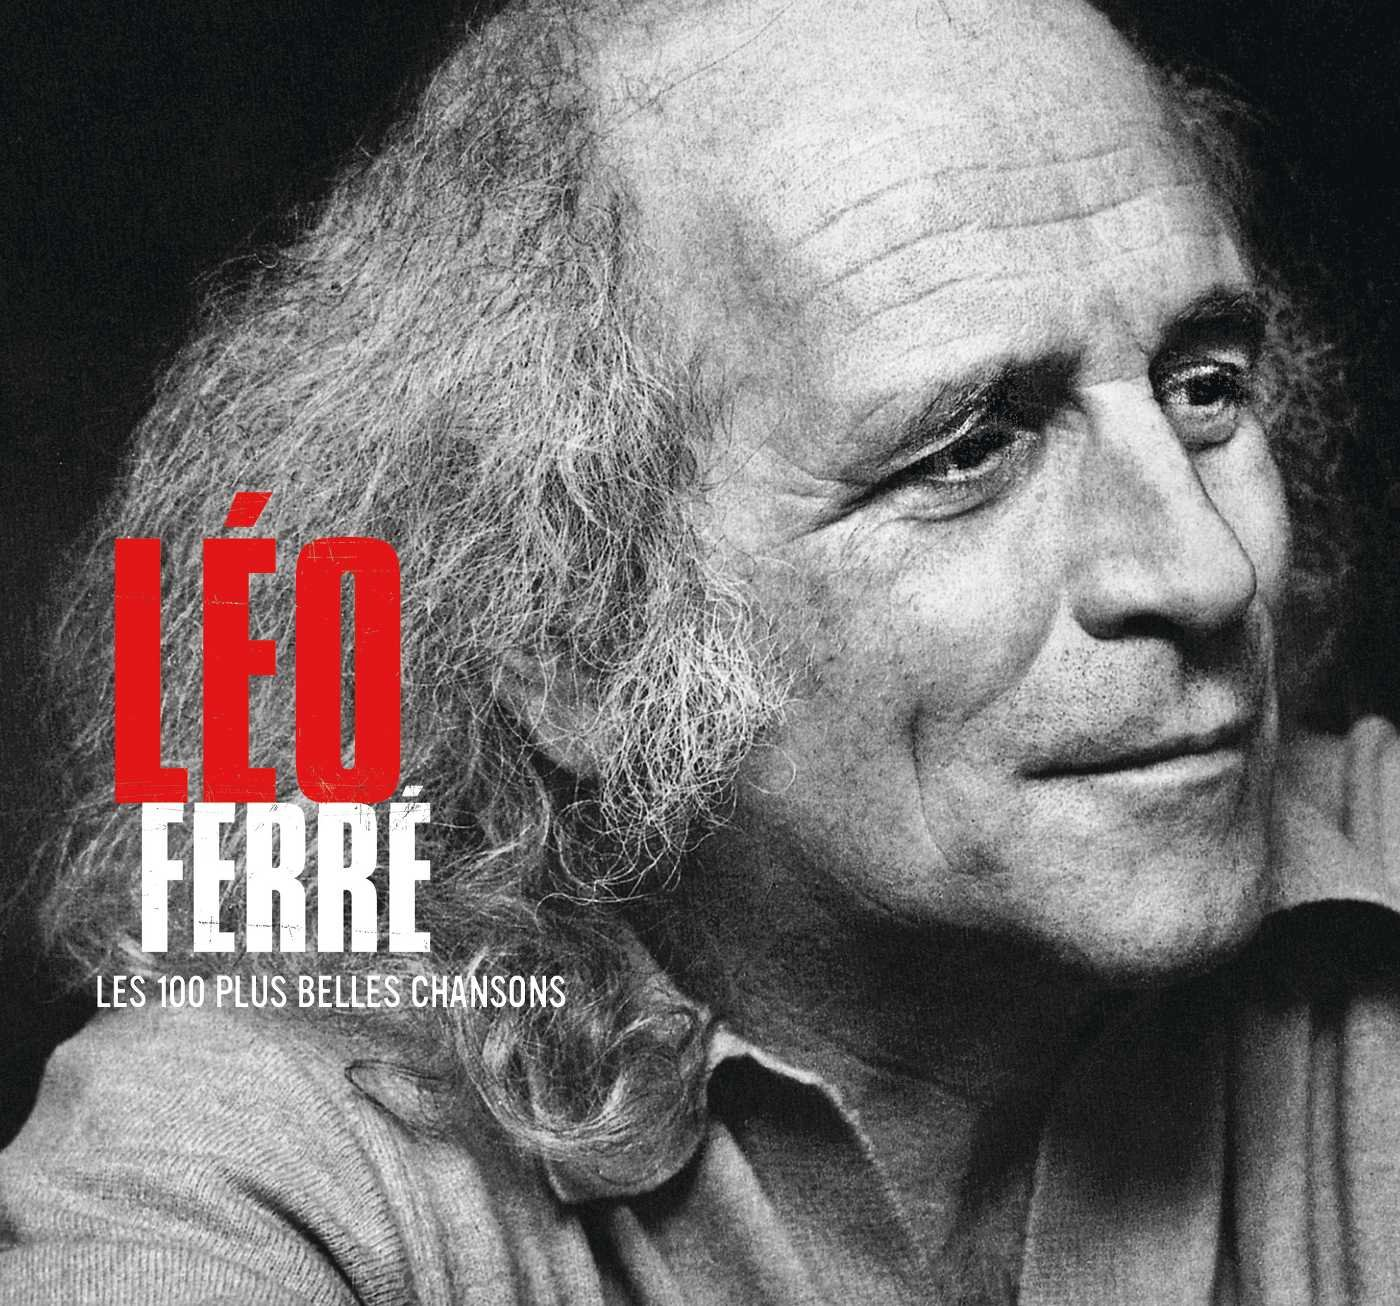 CD : Leo Ferre - Les 100 Plus Belles Chansons (United Kingdom - Import)